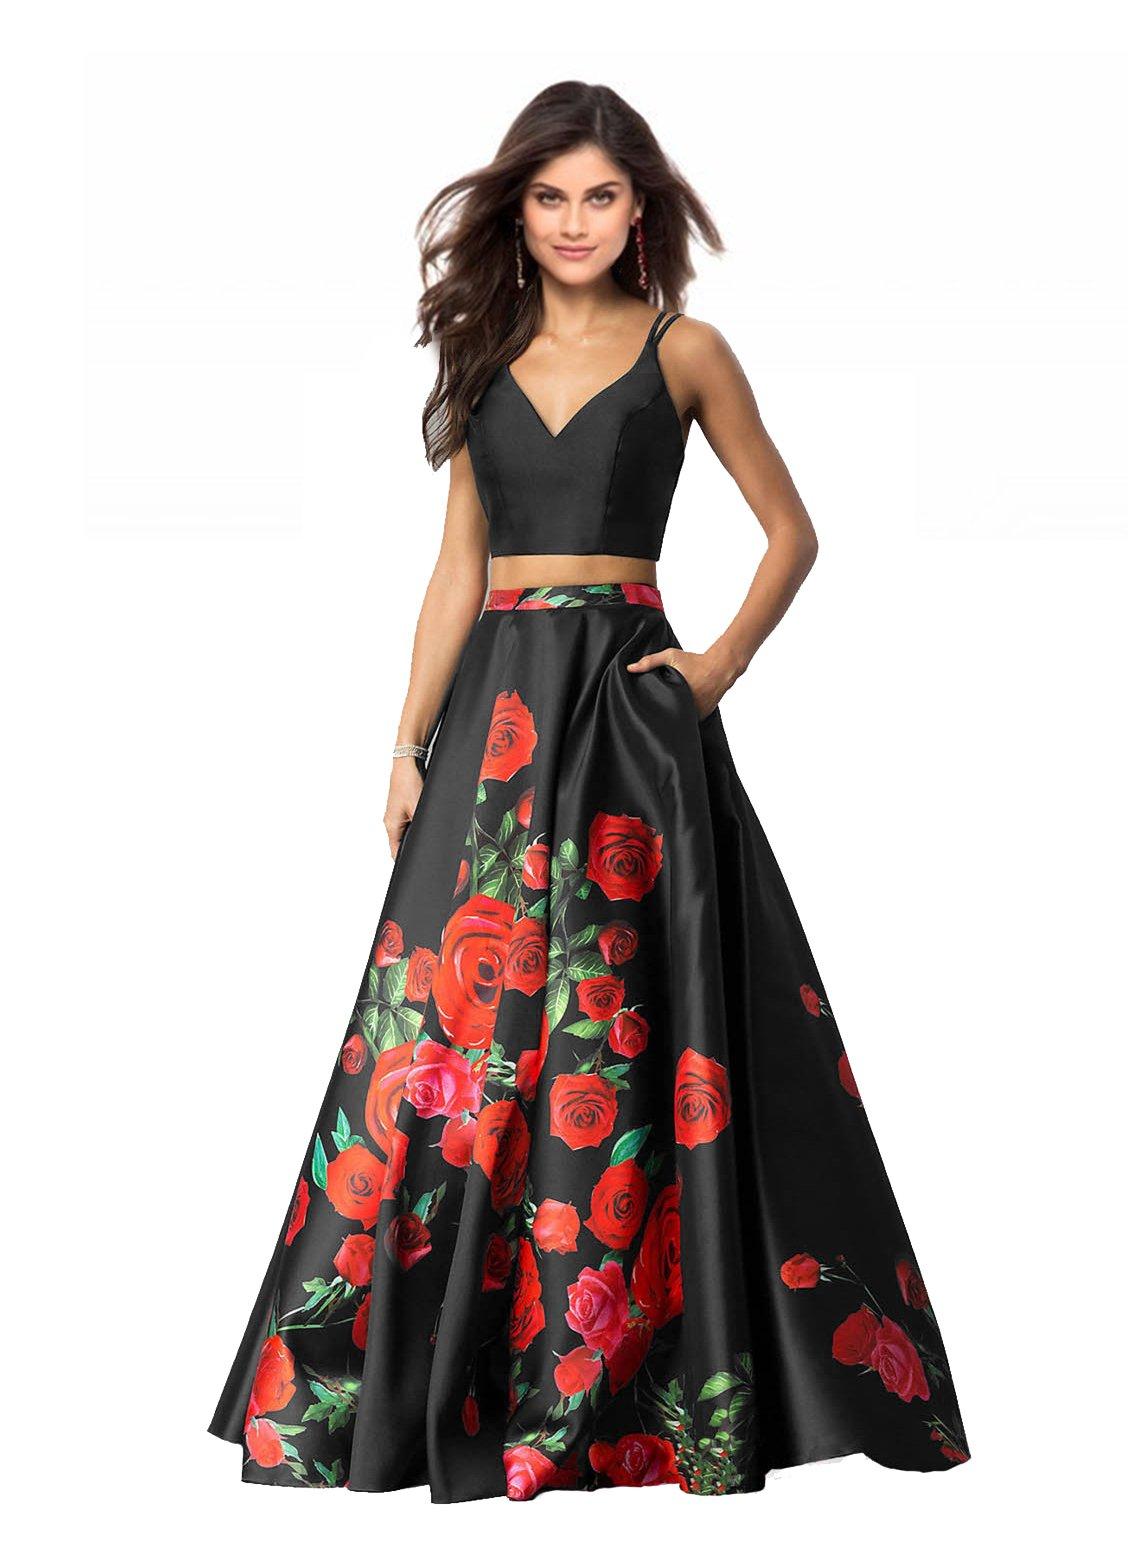 3187a5afd83 2 Piece Prom Dresses Black